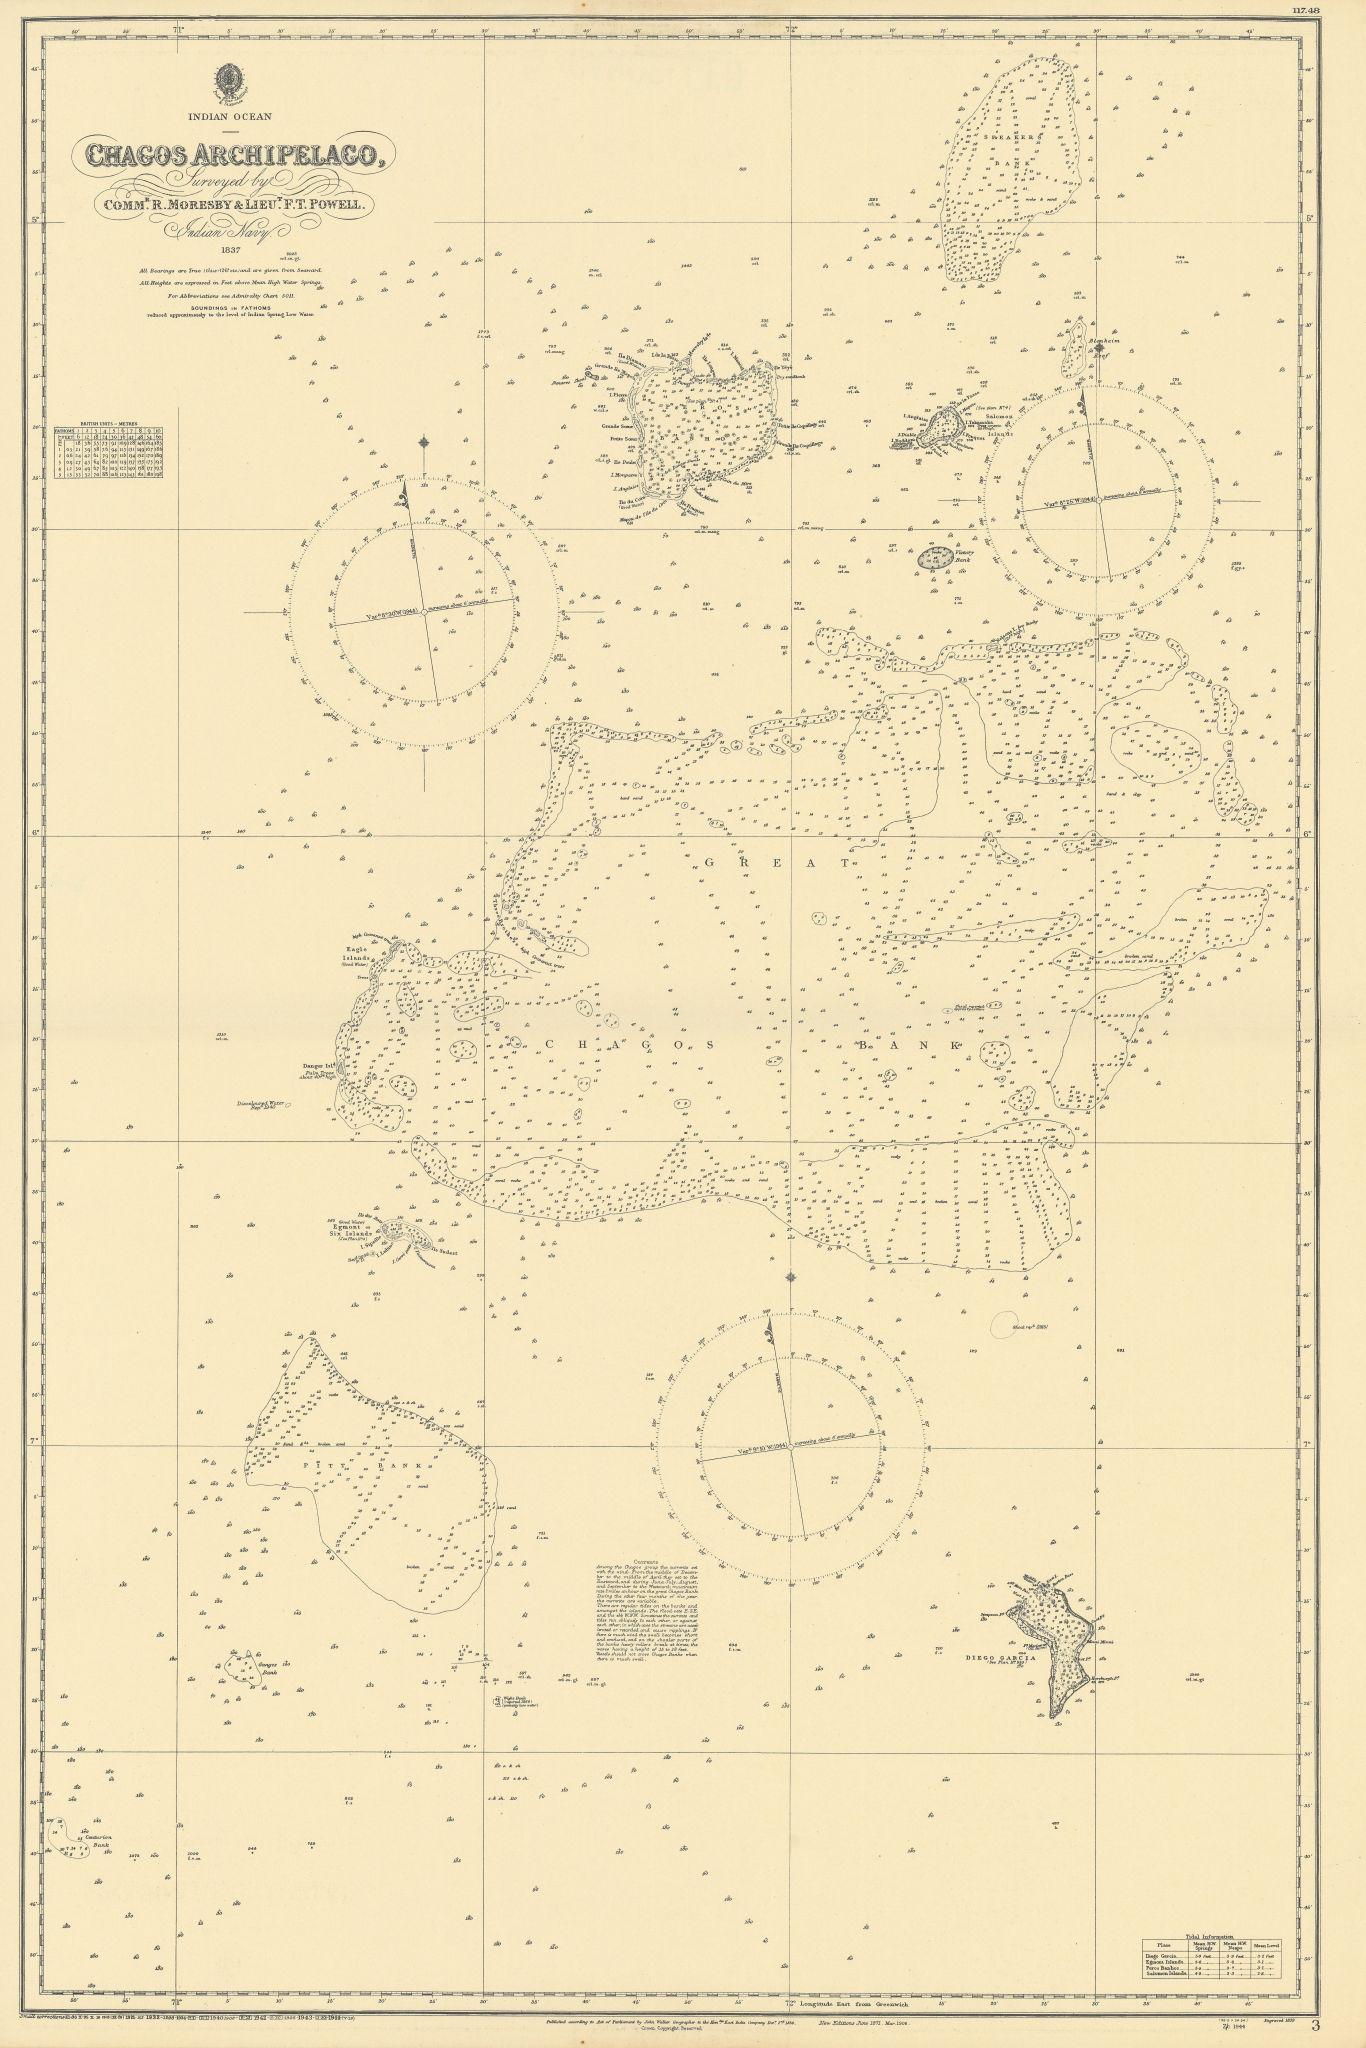 Chagos Archipelago Indian Ocean EAST INDIA COMPANY/Walker chart 1839 (1944) map